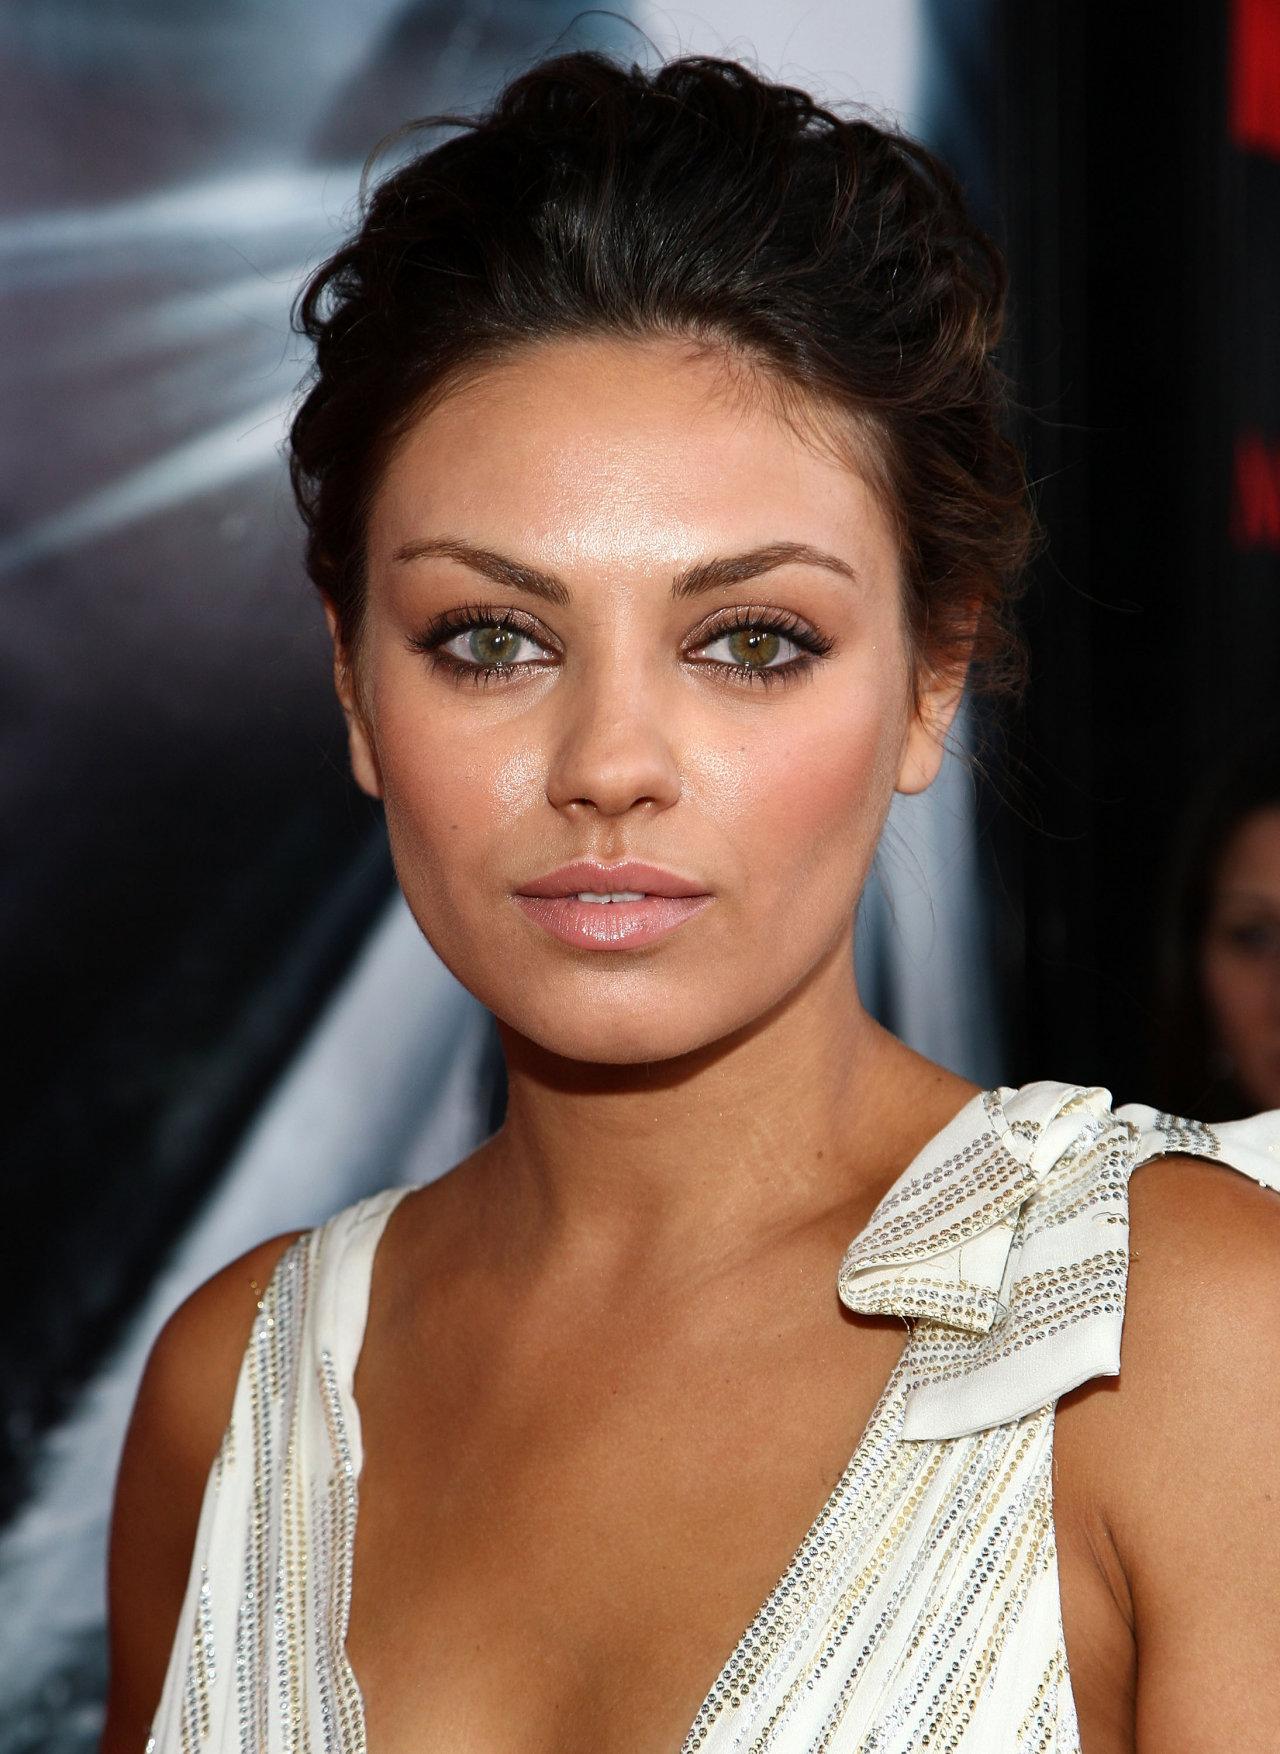 Wedding Makeup Looks For Brunettes With Brown Eyes : Mila Kunis wallpapers (102411). Popular Mila Kunis ...